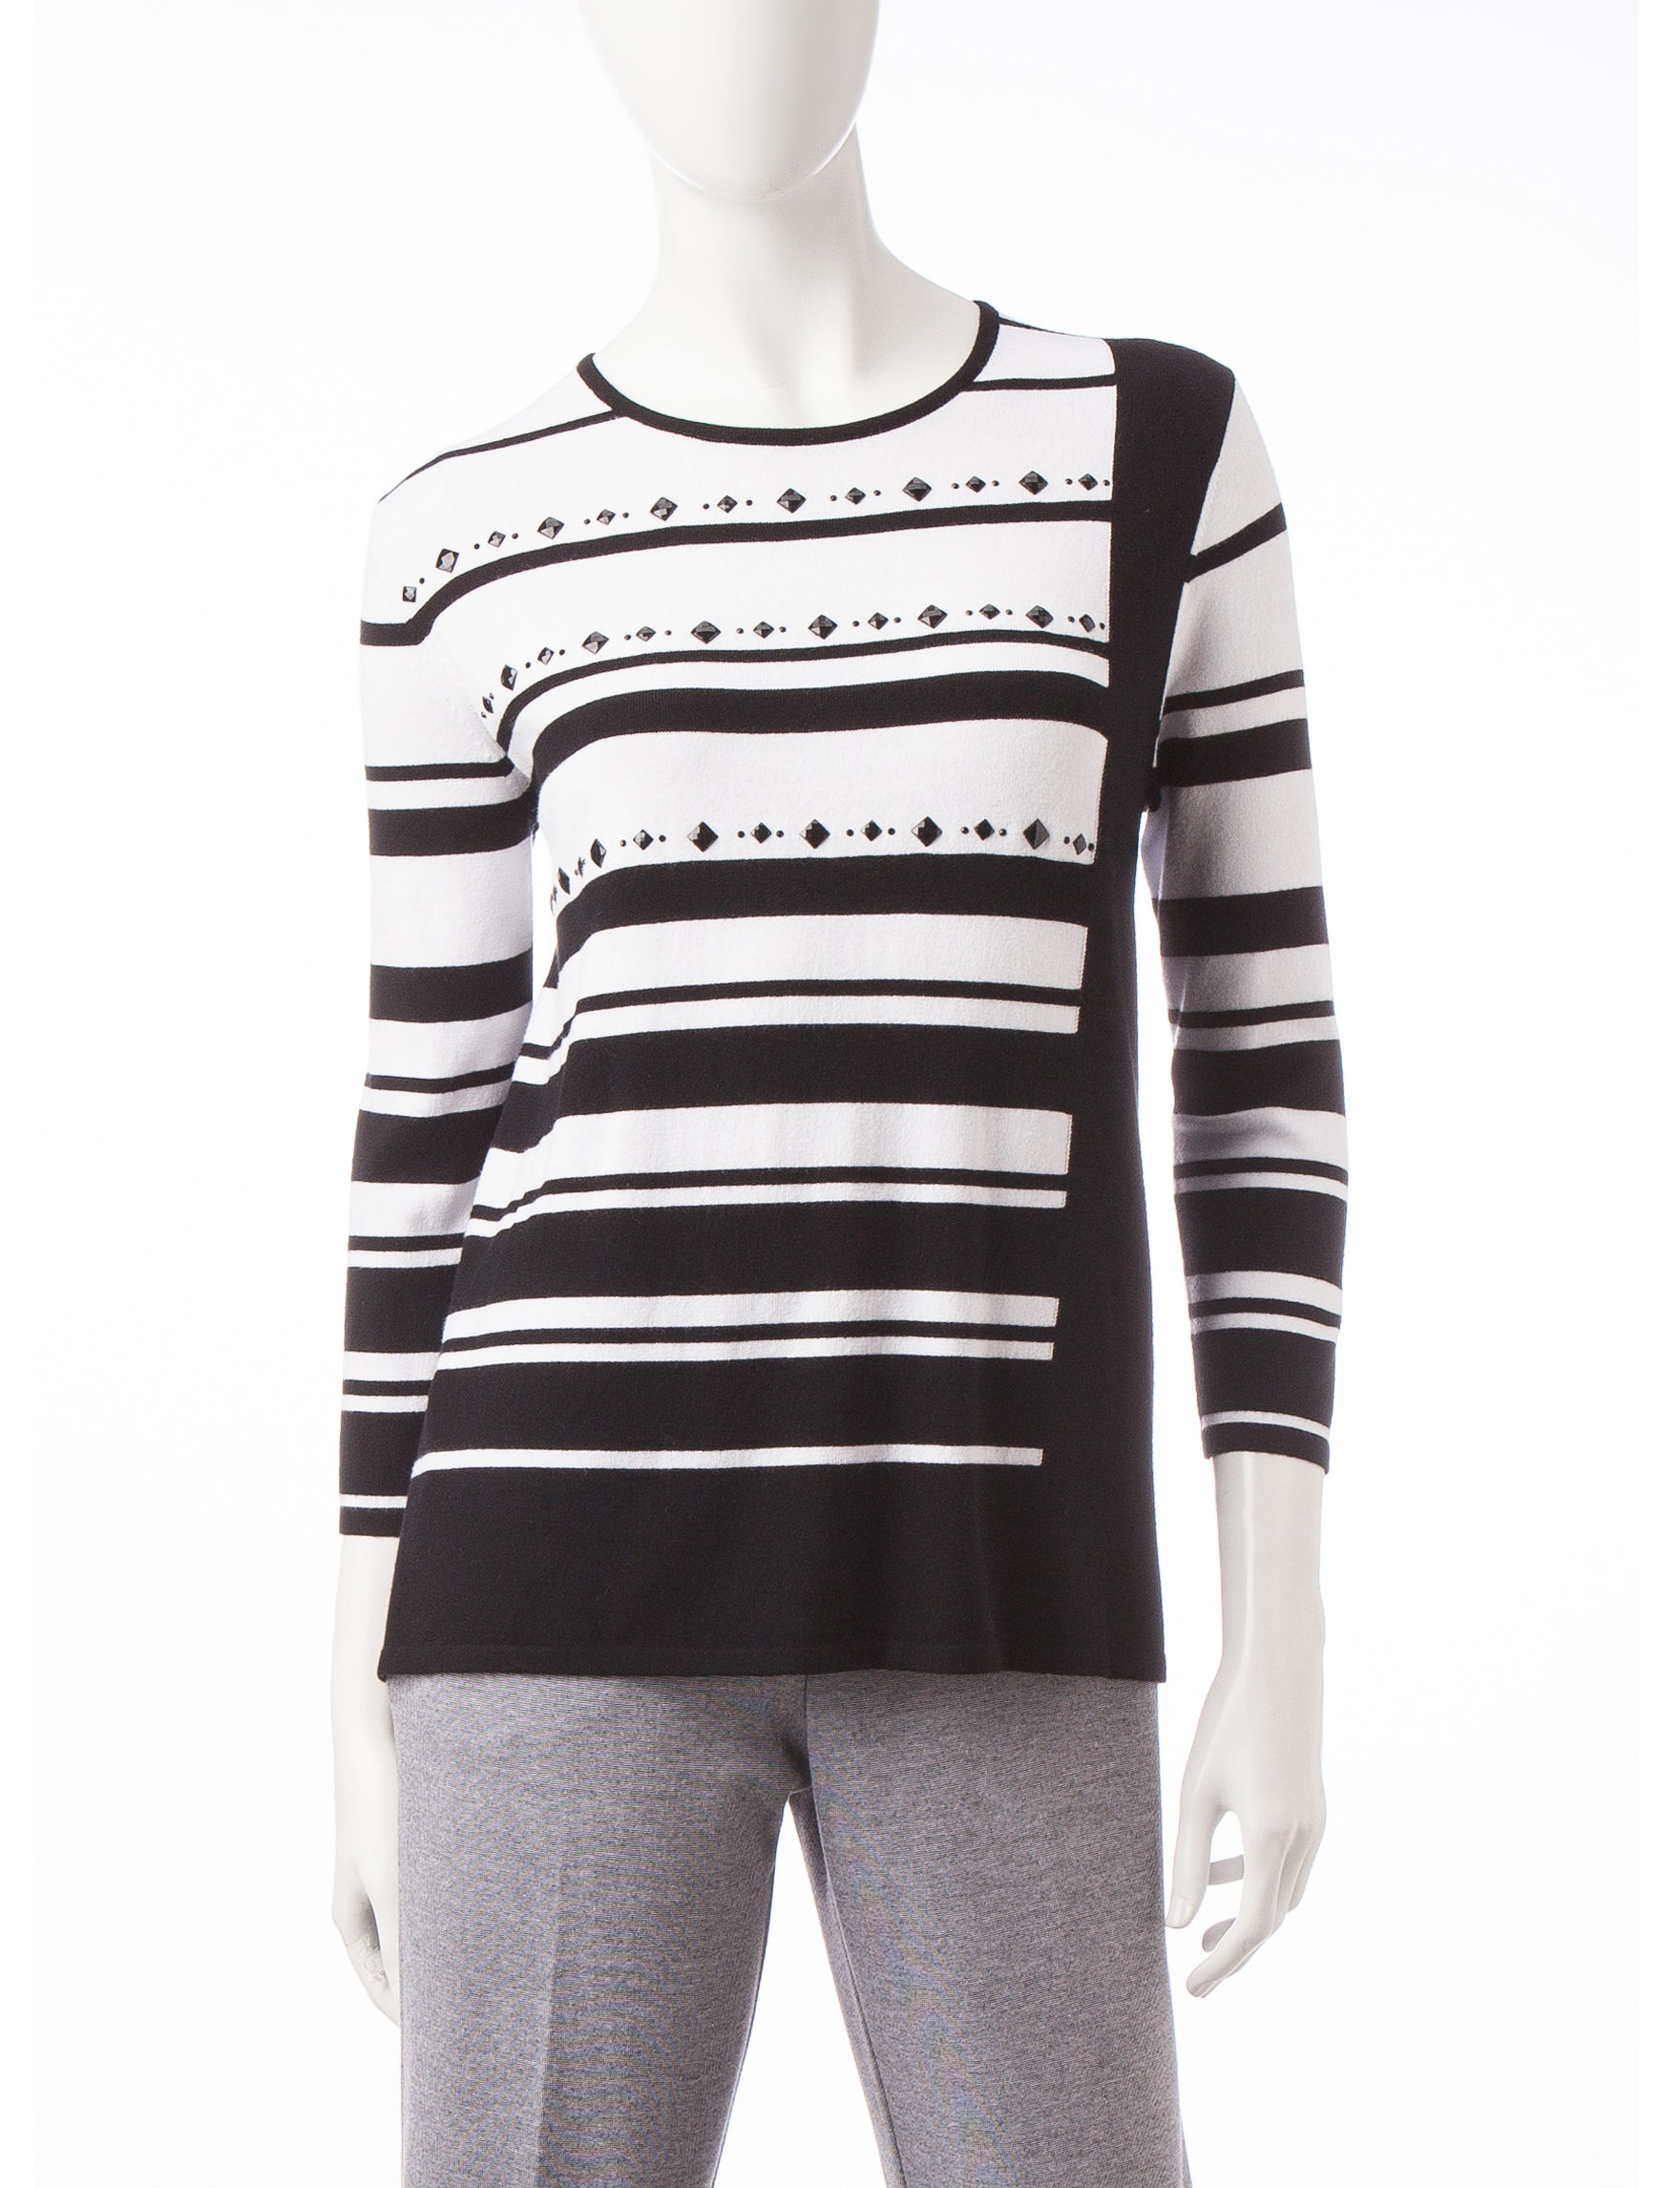 Alfred Dunner Black Multi Shirts & Blouses